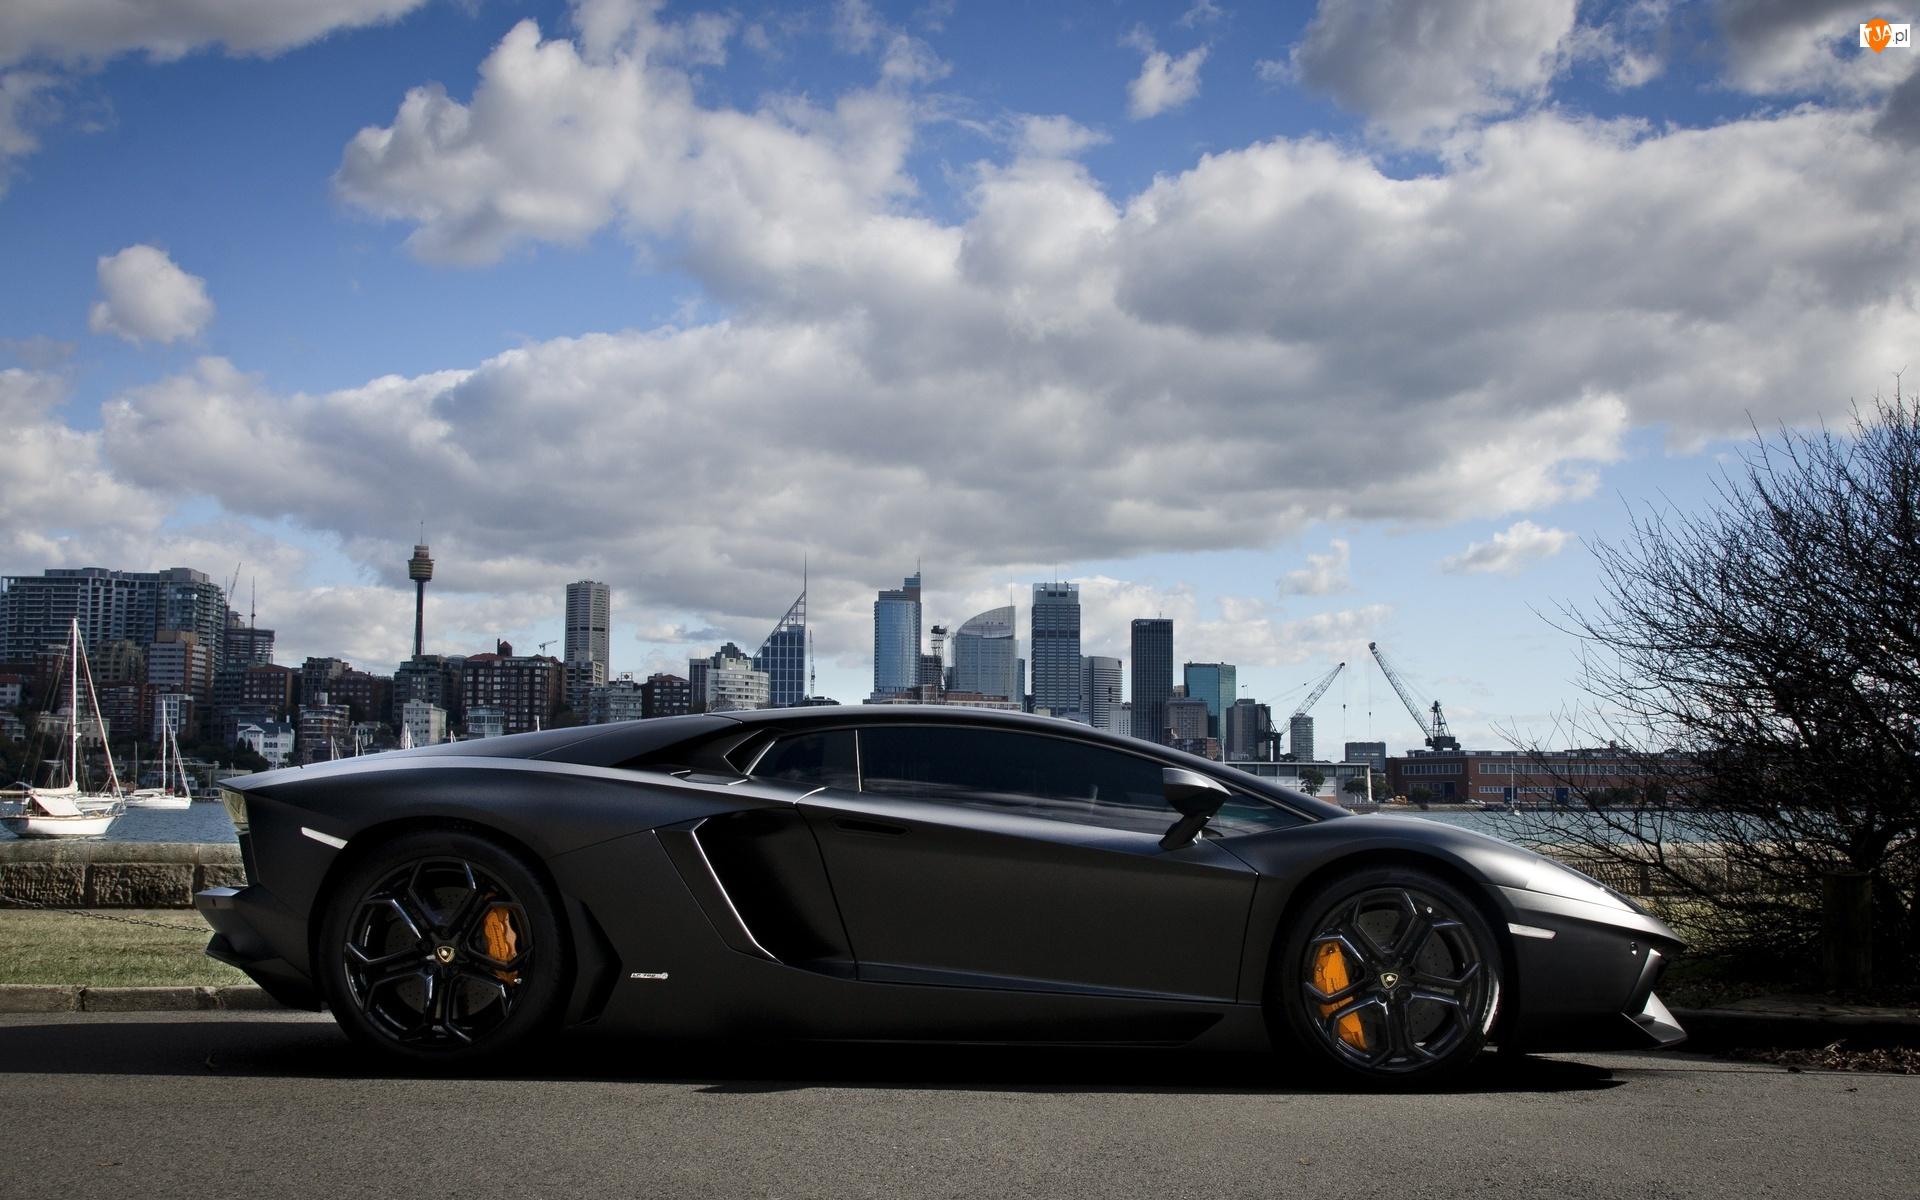 Ulica, Miasta, Lamborghini, Chmury, Aventador, Panorama